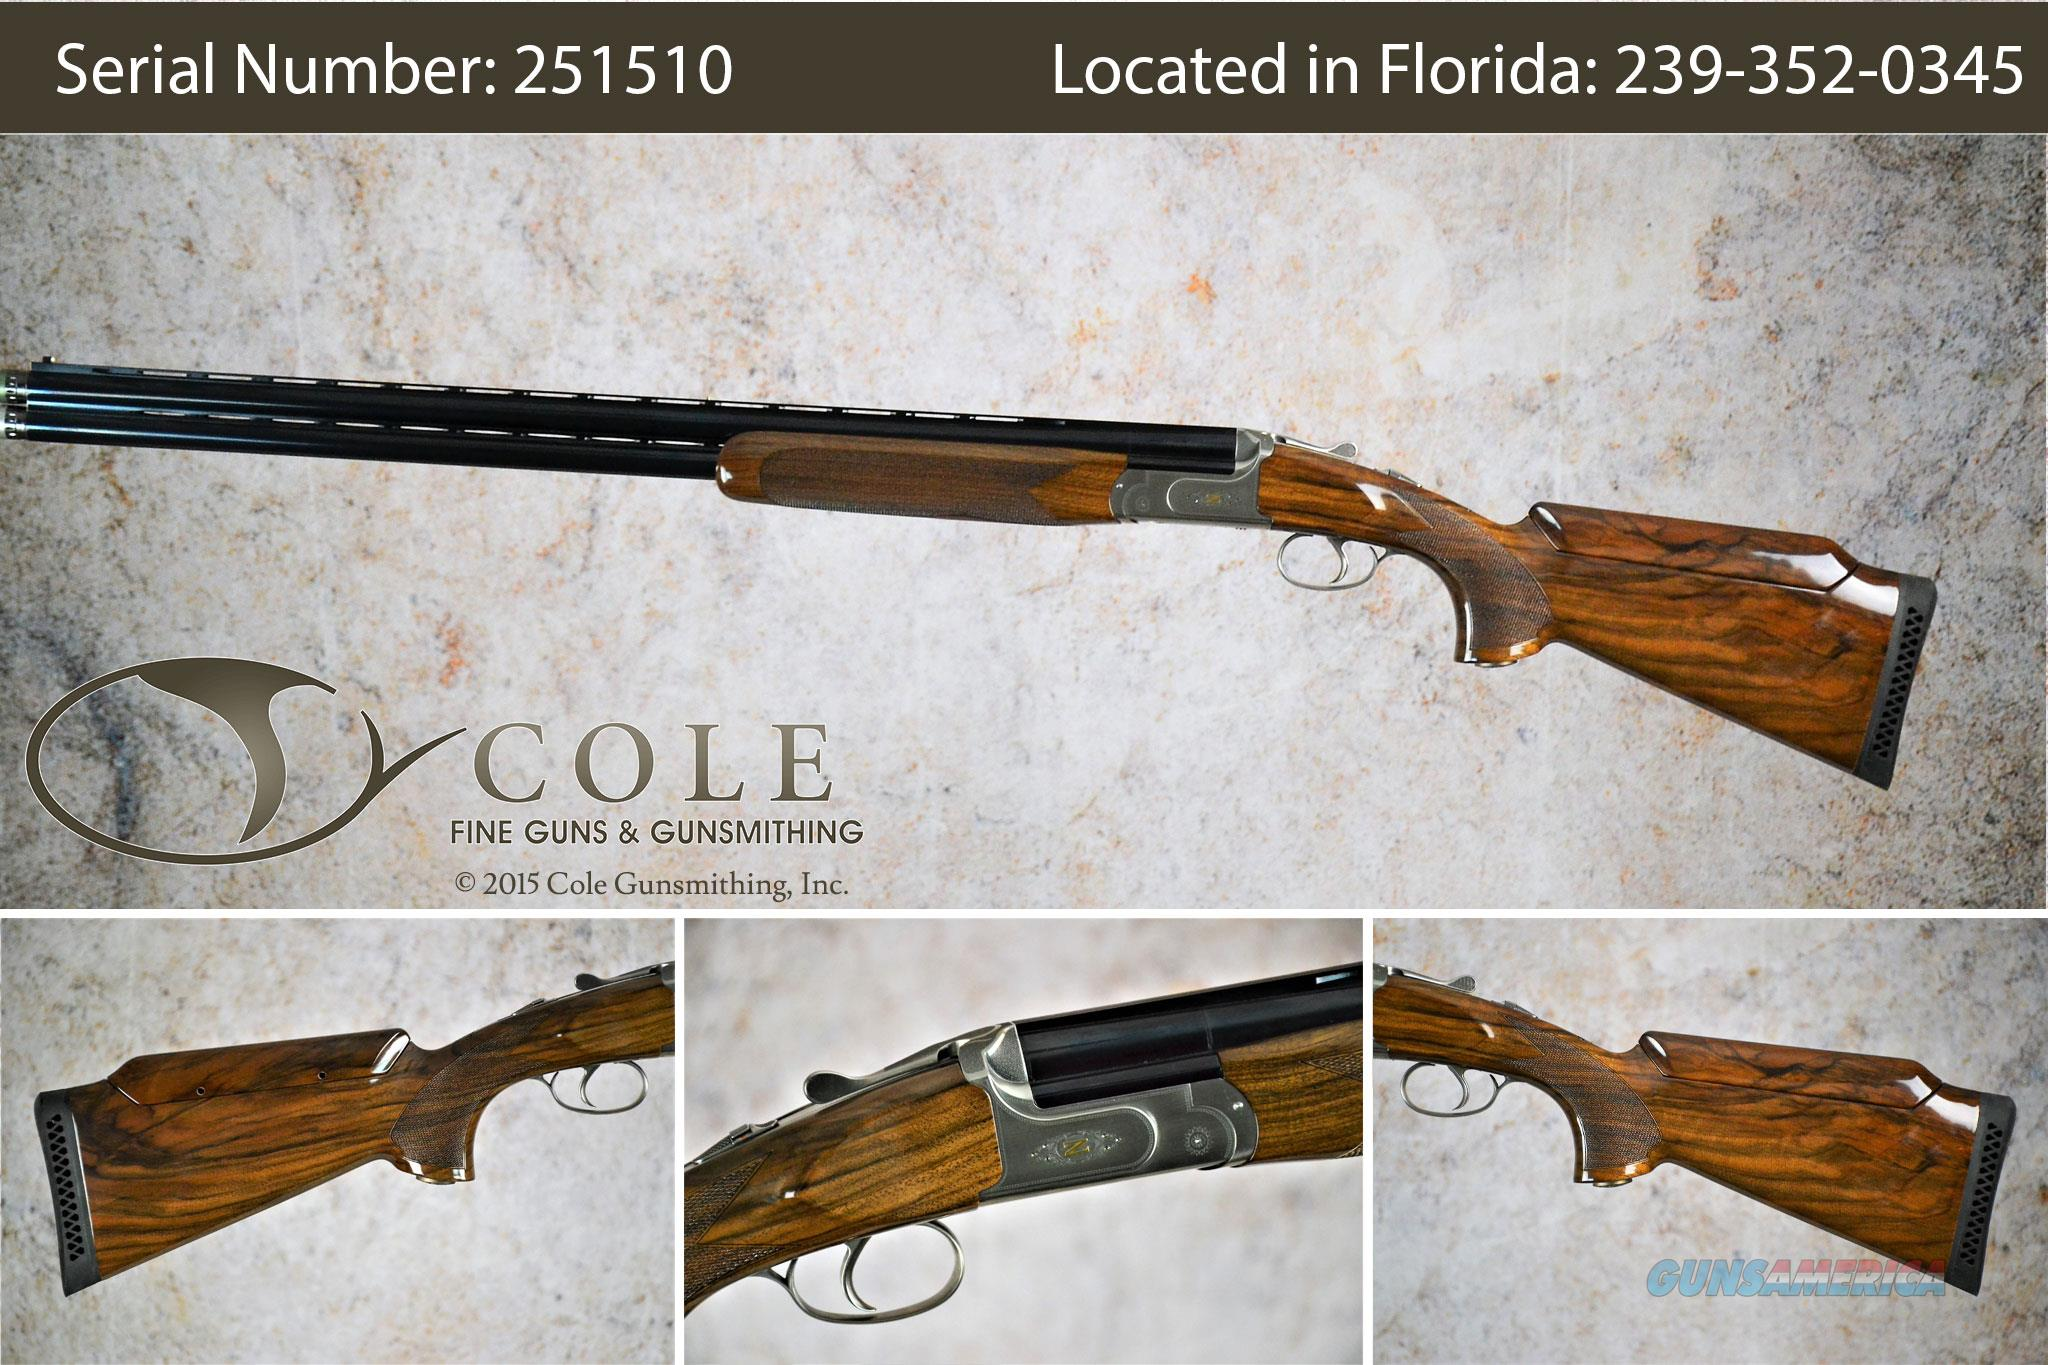 "Zoli Z-Bella FR Sporting 12g 30"" SN:#251510  Guns > Shotguns > XYZ Misc Shotguns"